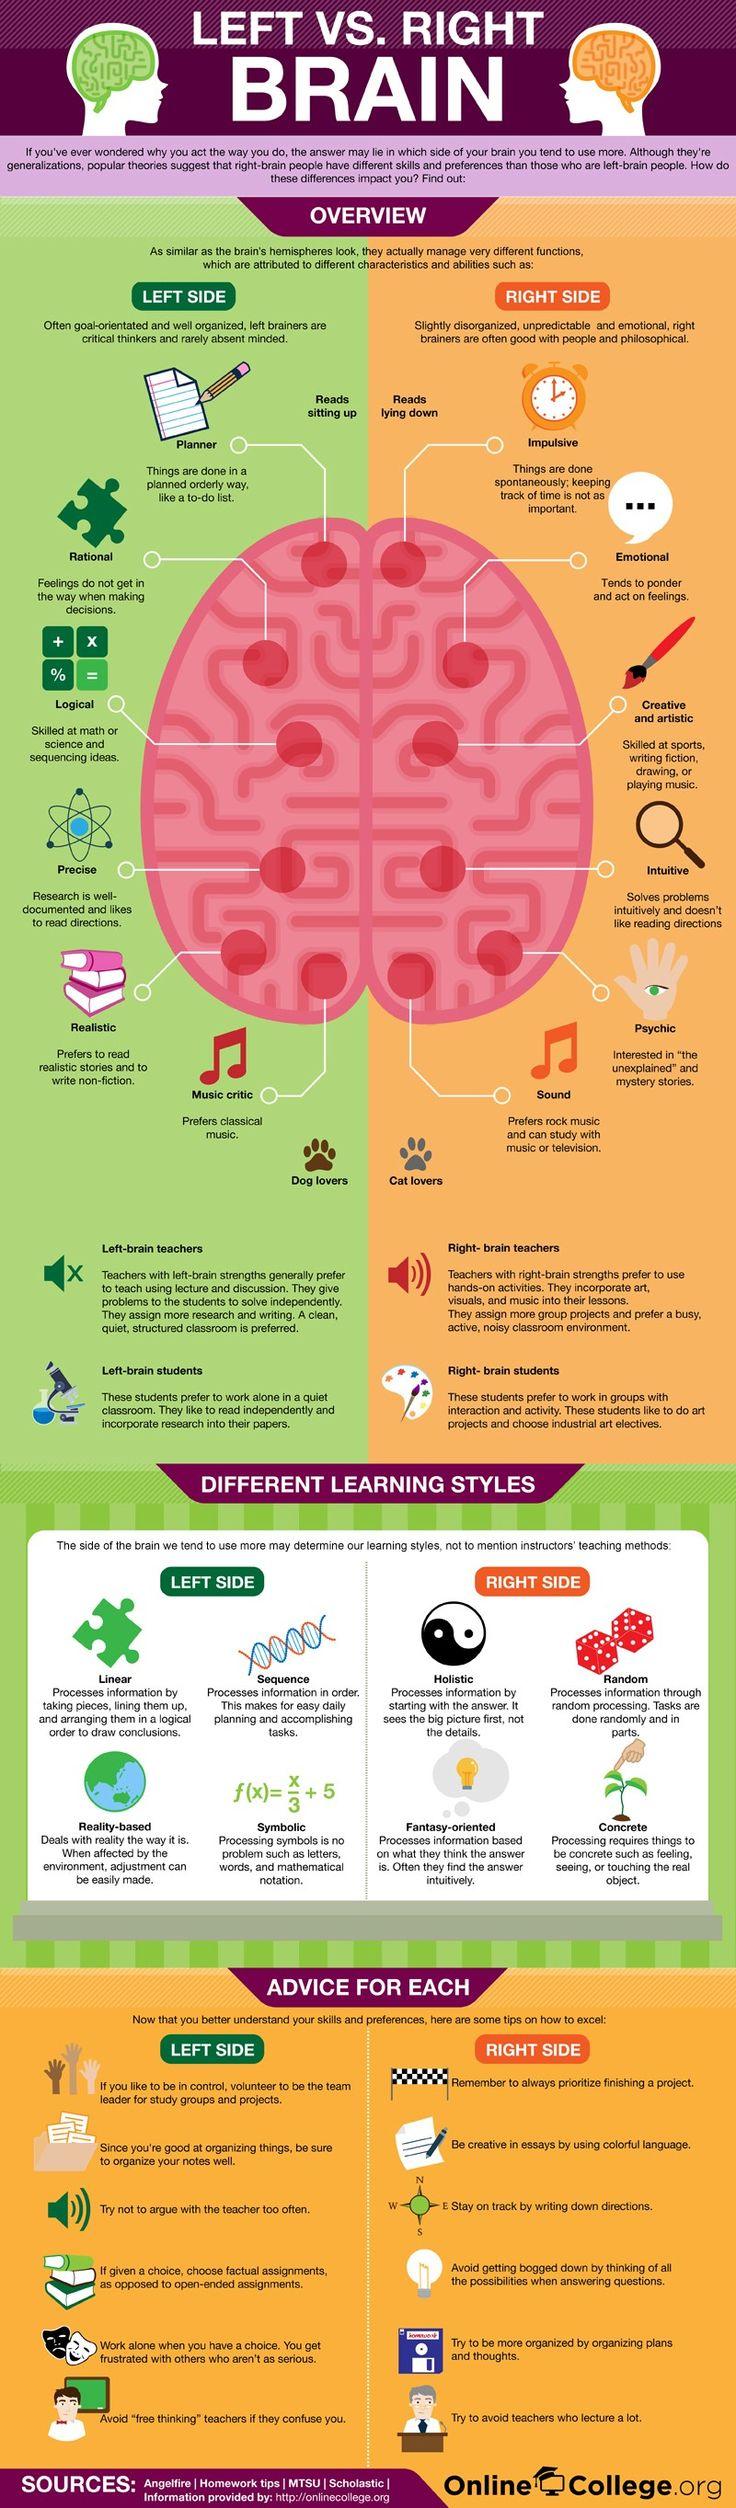 Function & Uses: Left Brain Side VS Right Brain Side #infographic